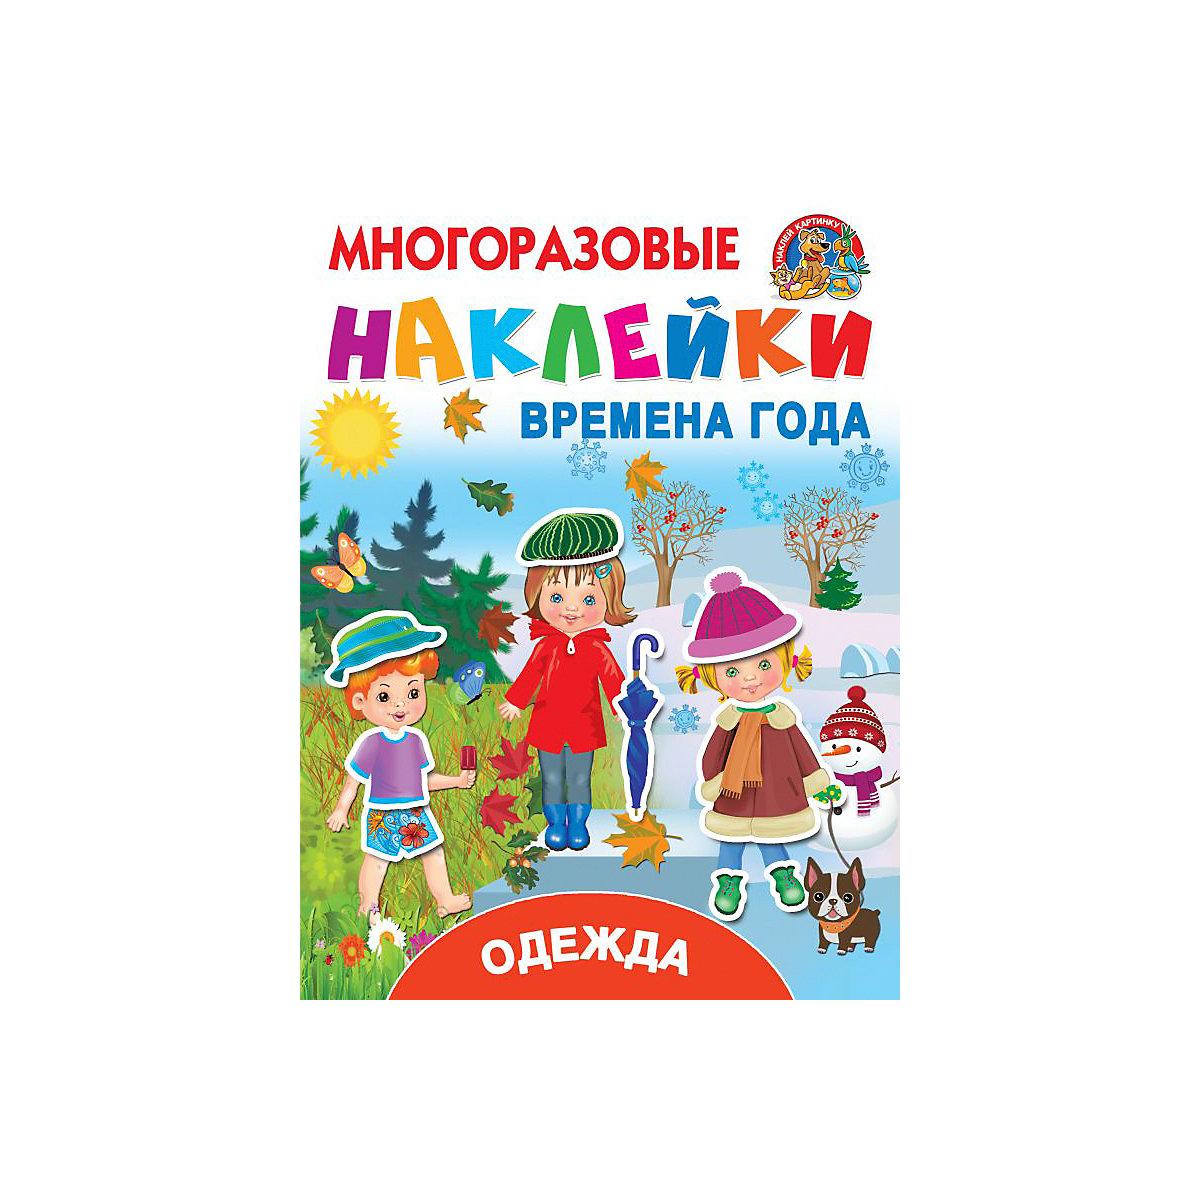 Книжка с наклейками АСТ Многоразовые наклейки. Одежда и времена года 113628-4